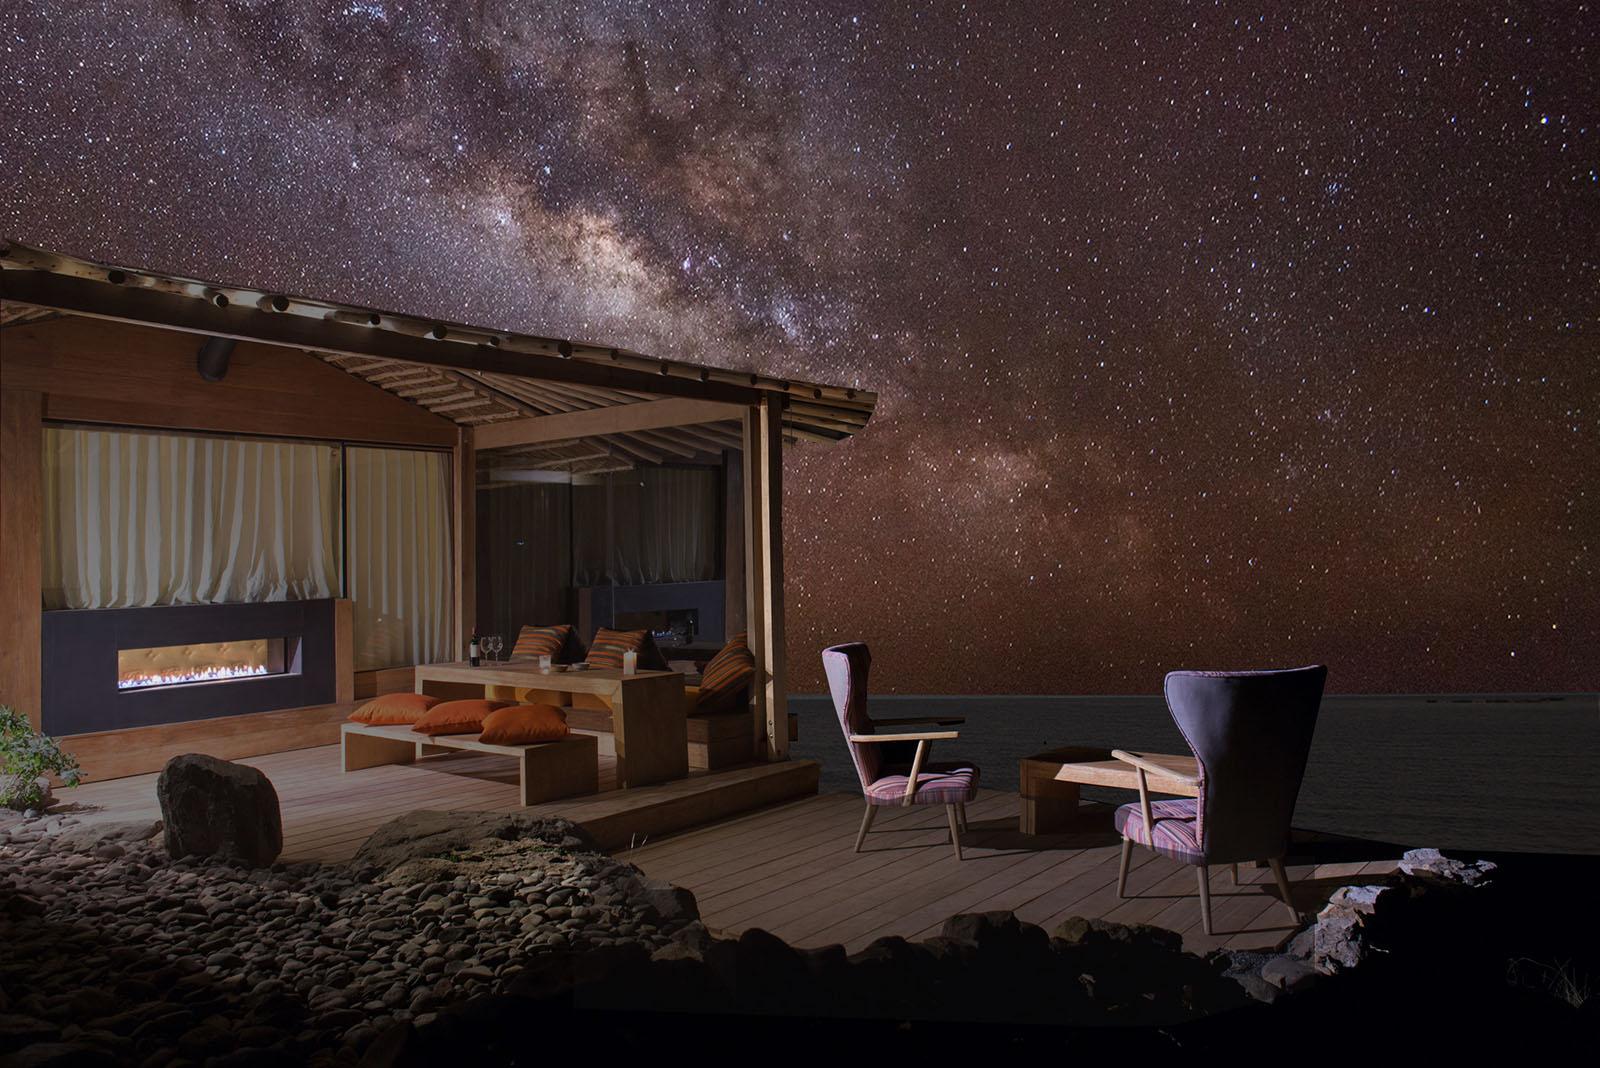 amantika-lodge-night-stars